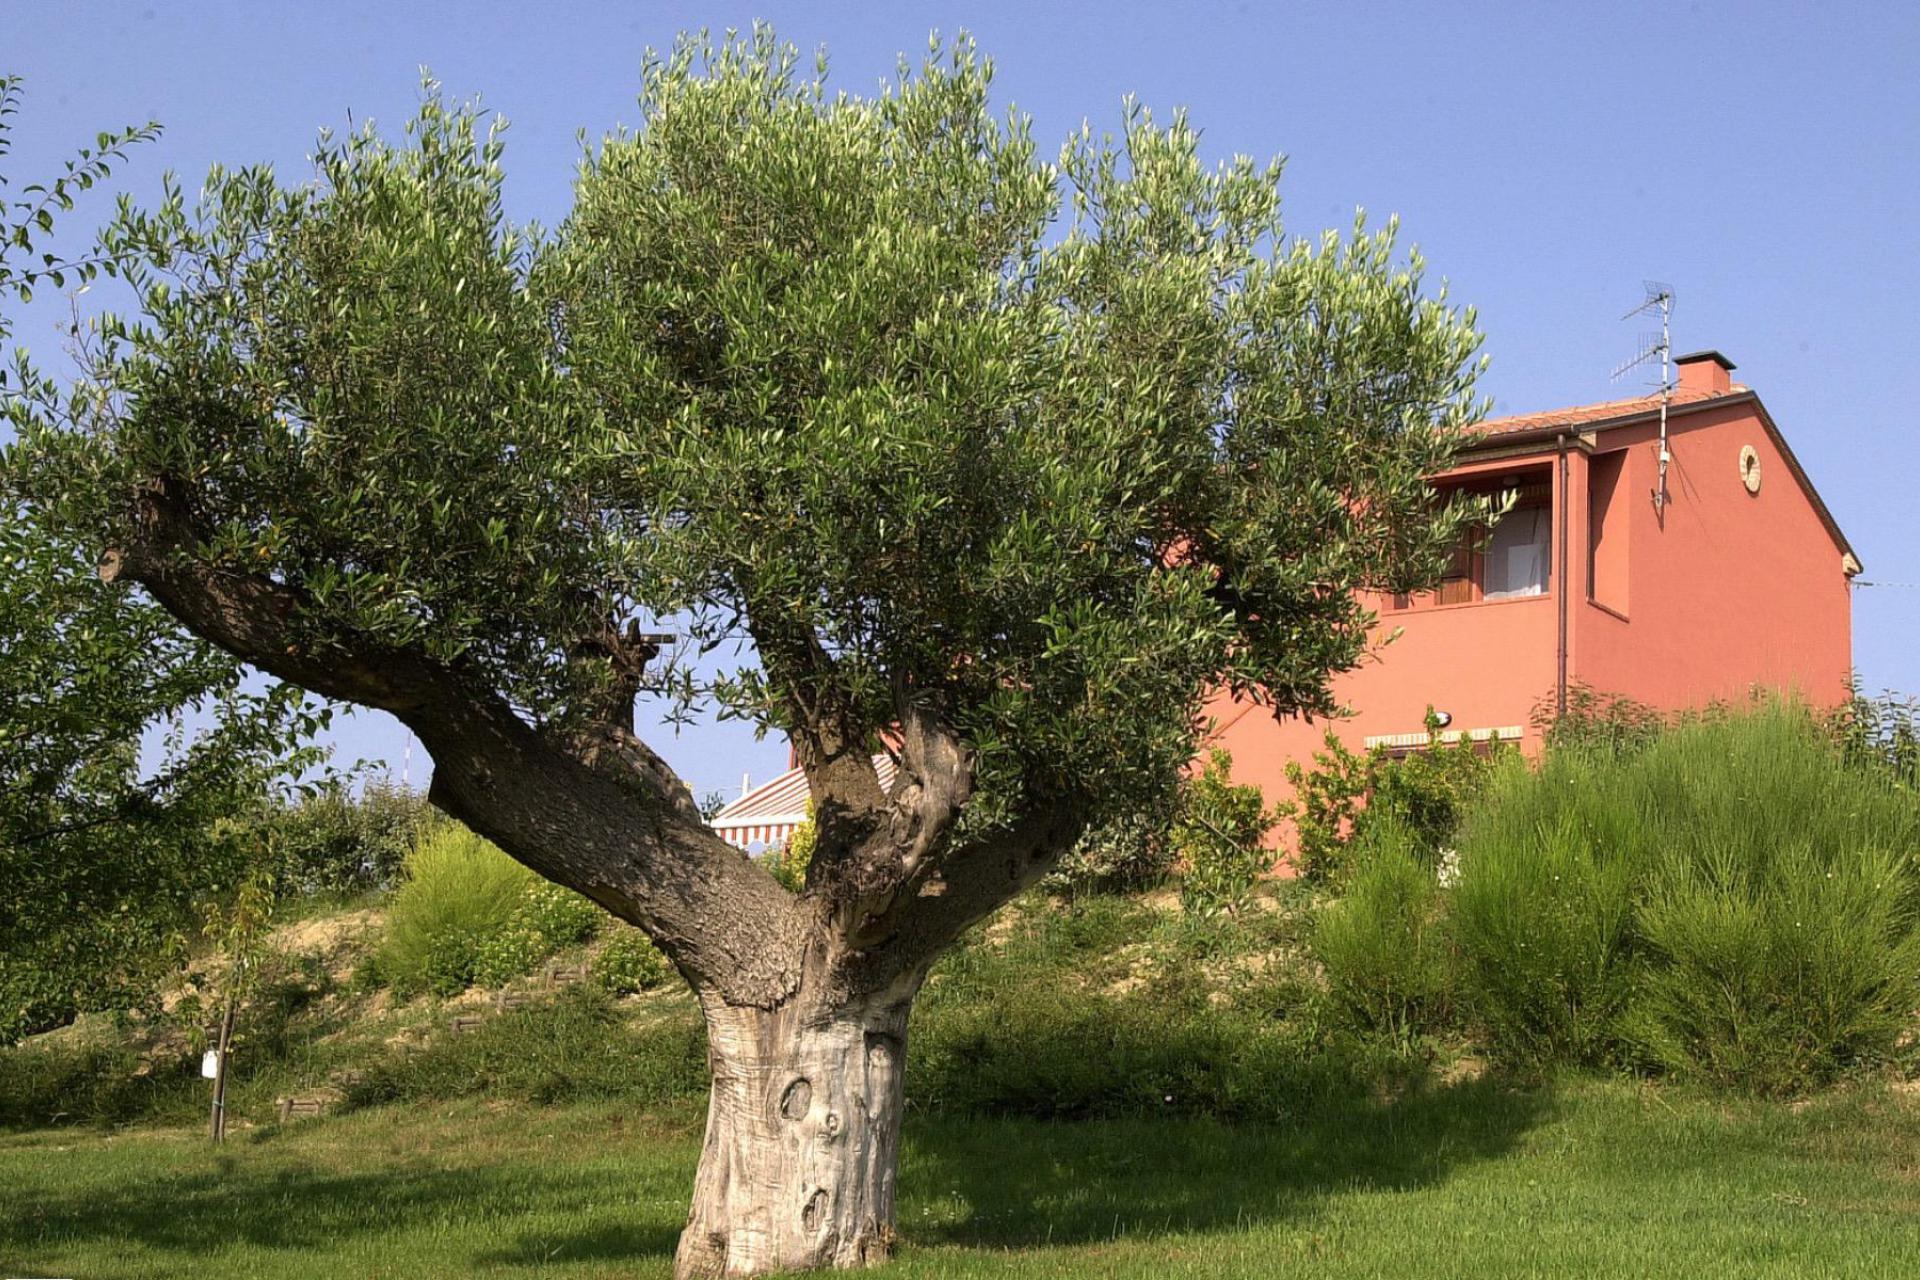 Agriturismo Le Marche Agriturismo le Marche met restaurant tussen olijfbomen